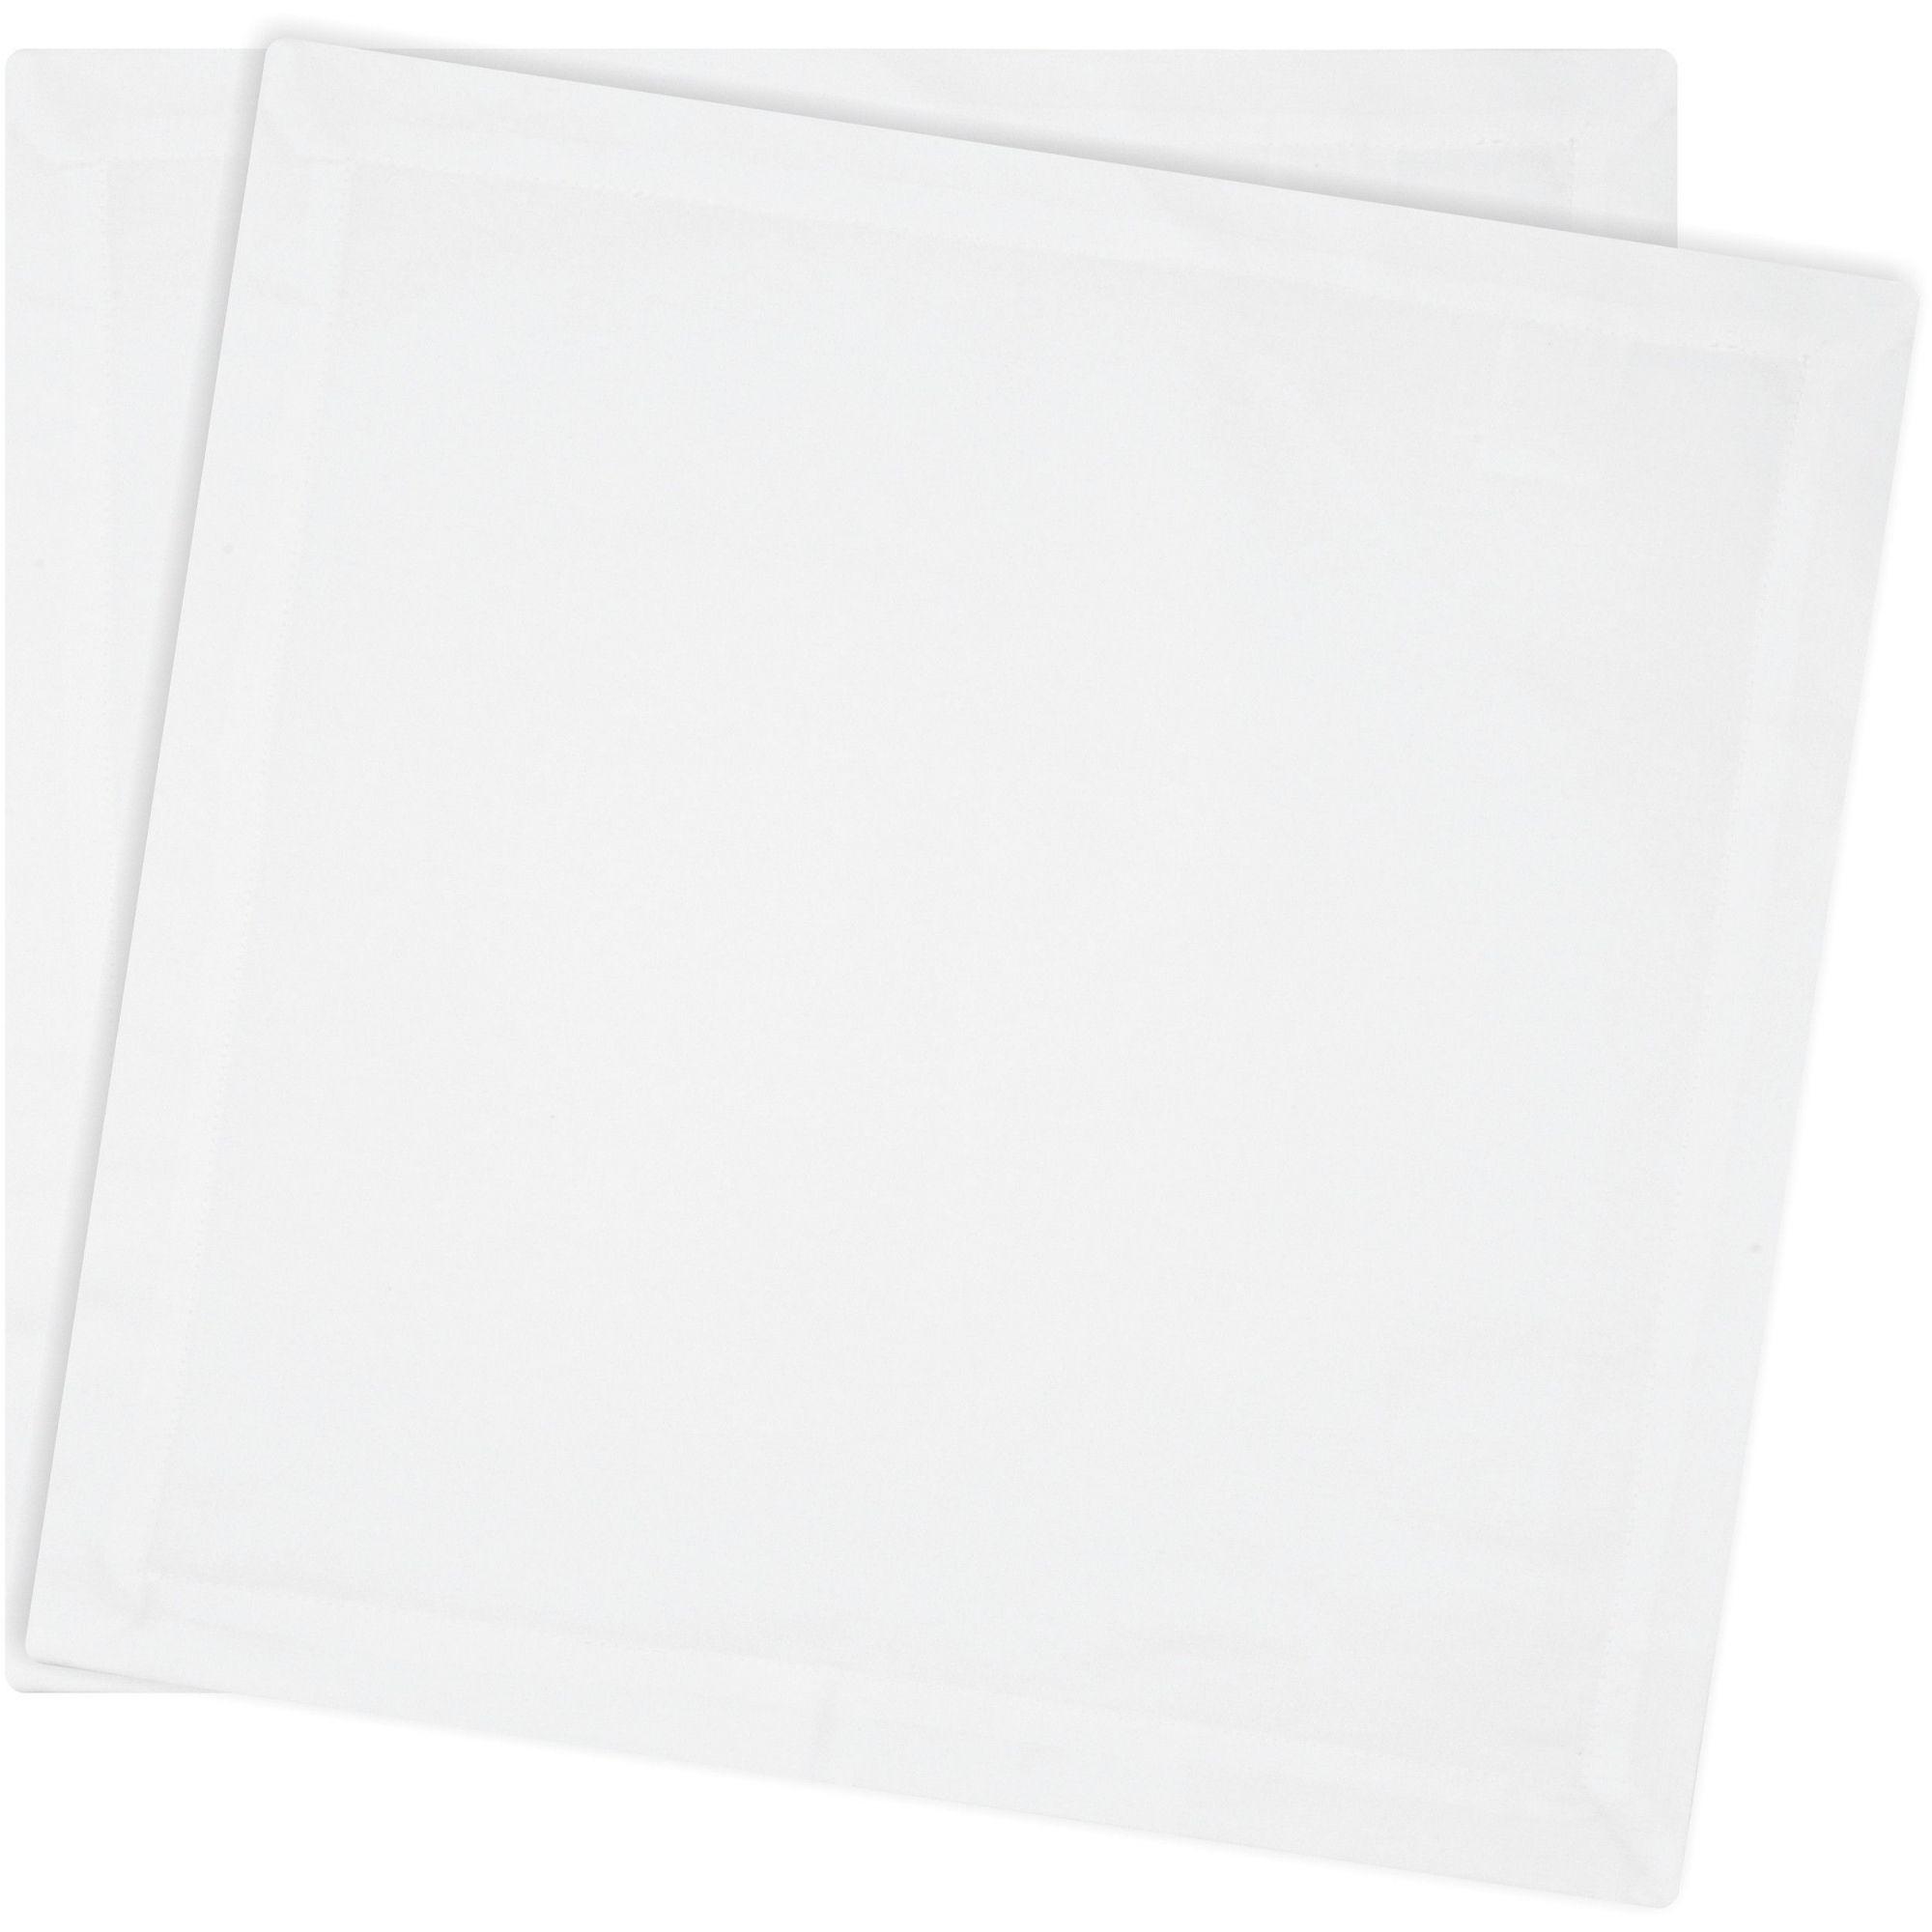 Jogo de Guardanapo Tecido 2pçs Composee Branco